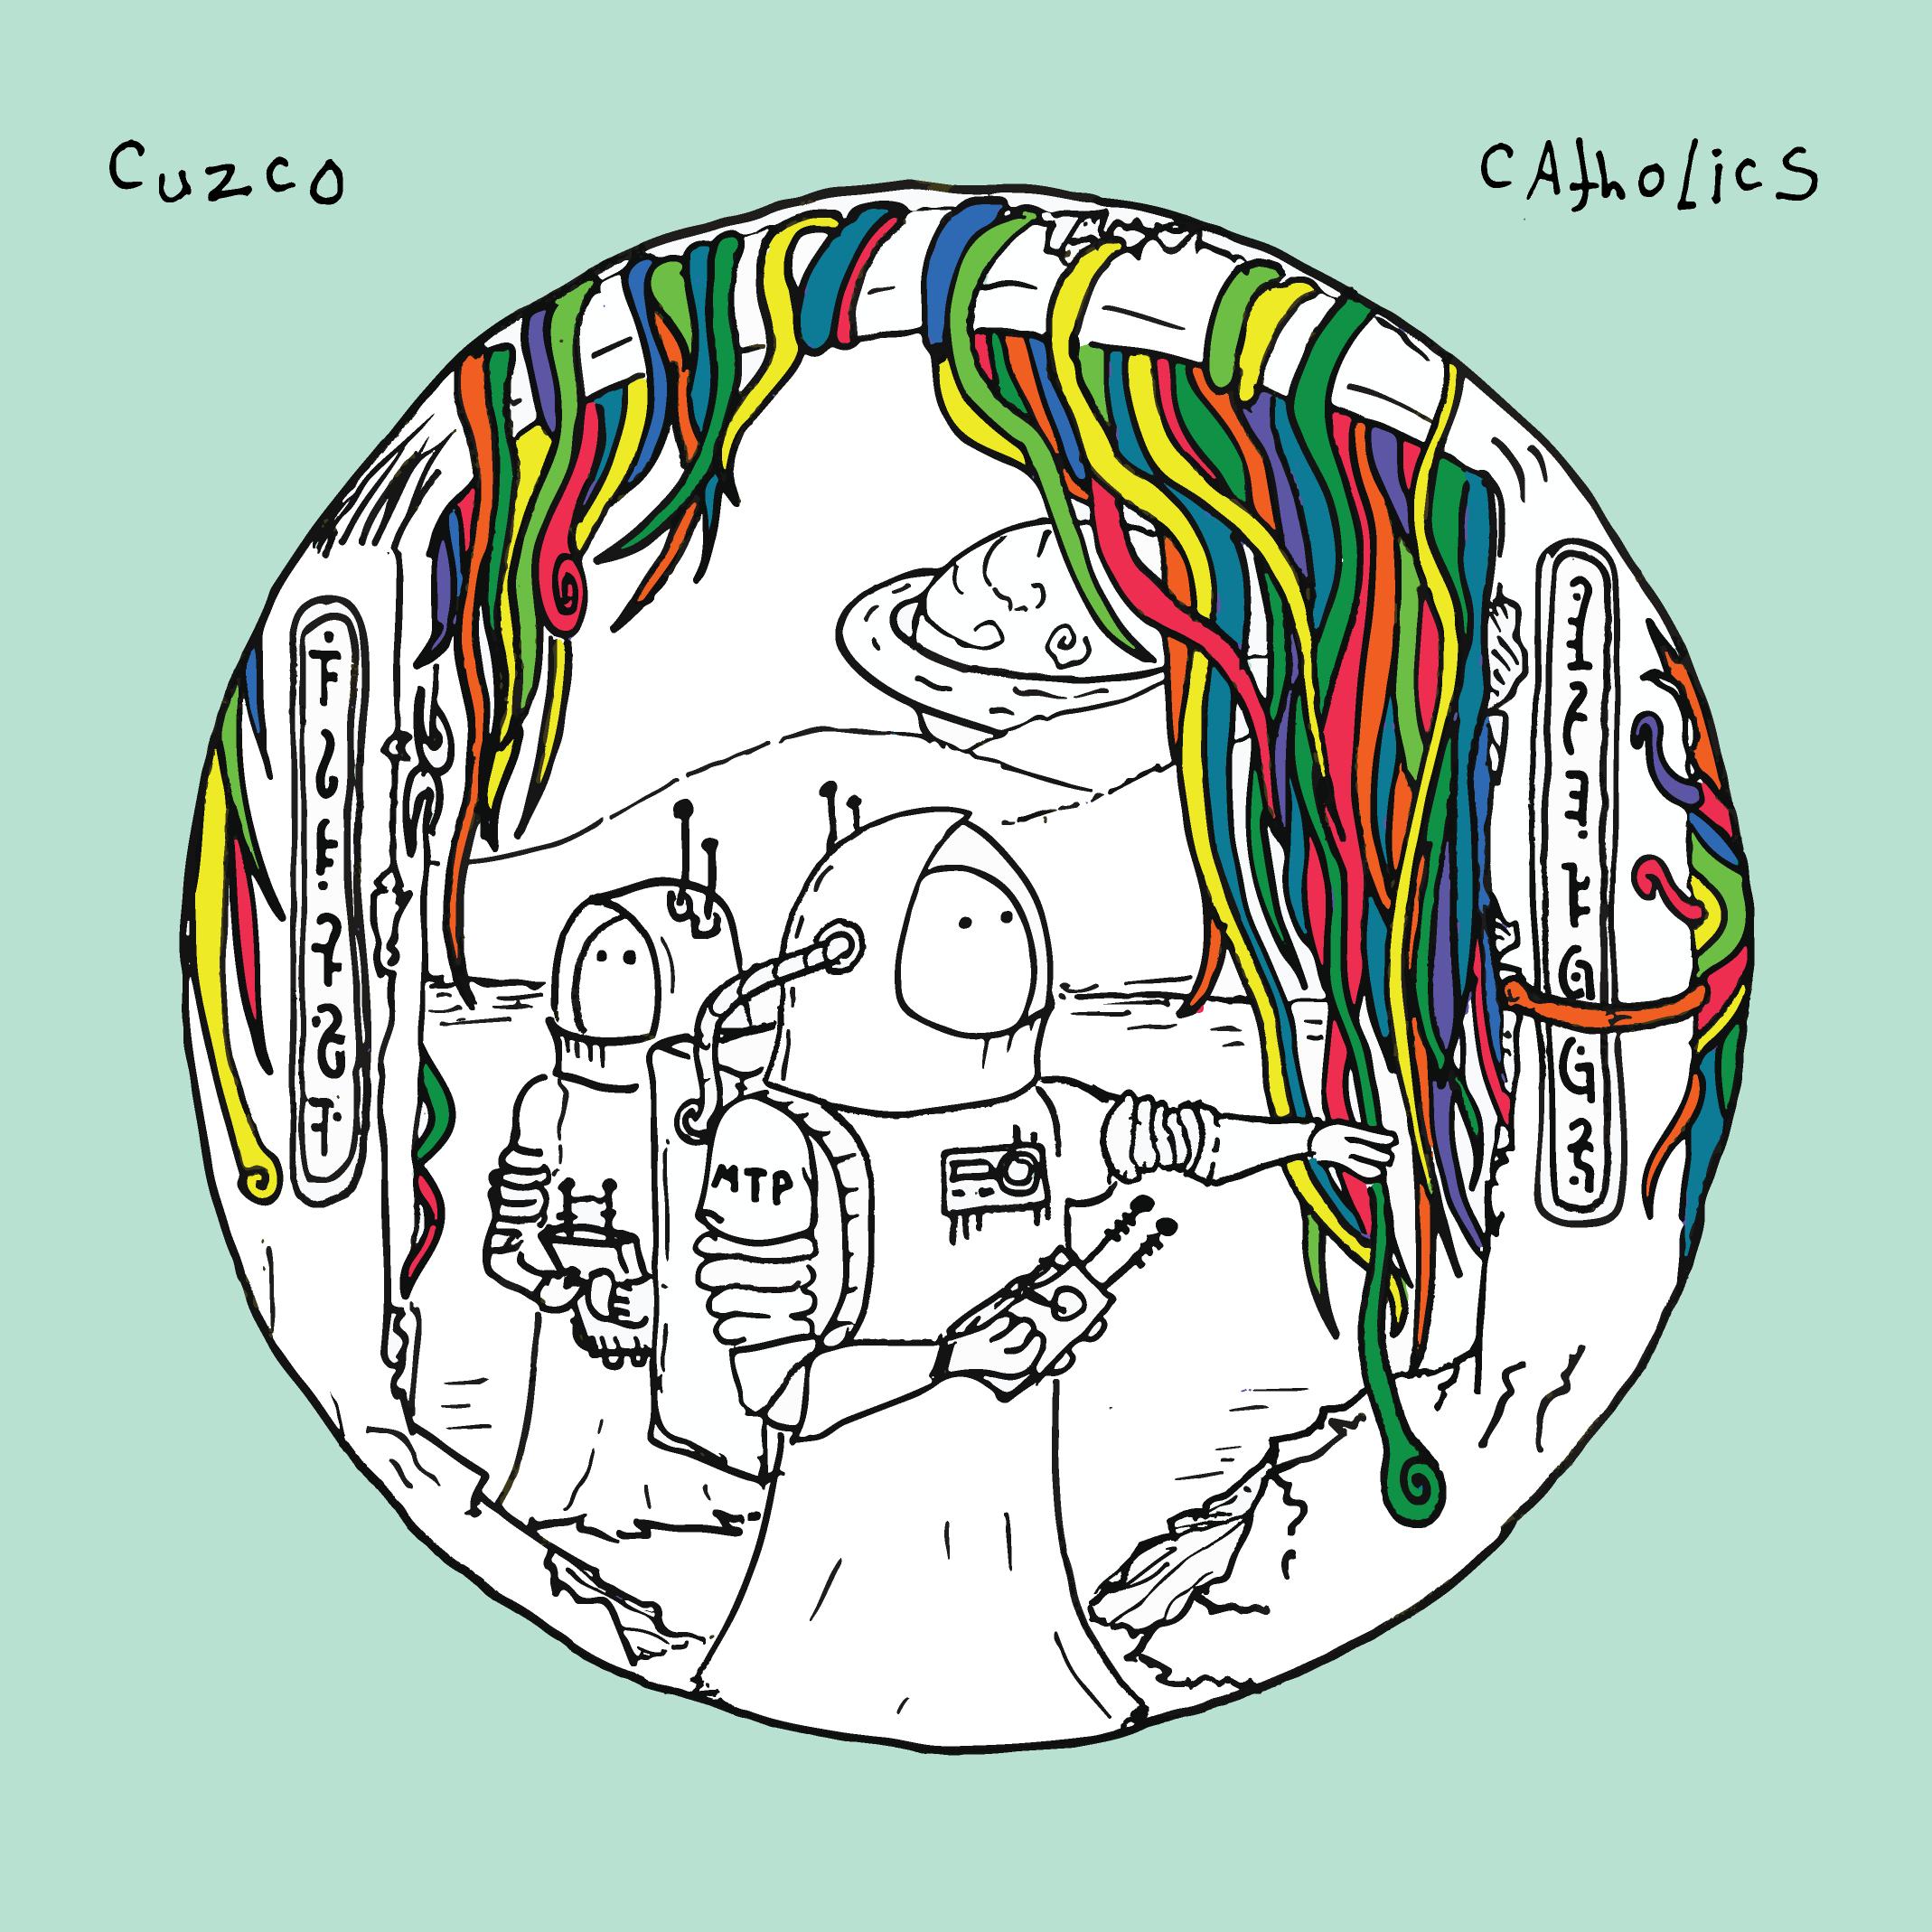 Cuzco / Catholics - Split